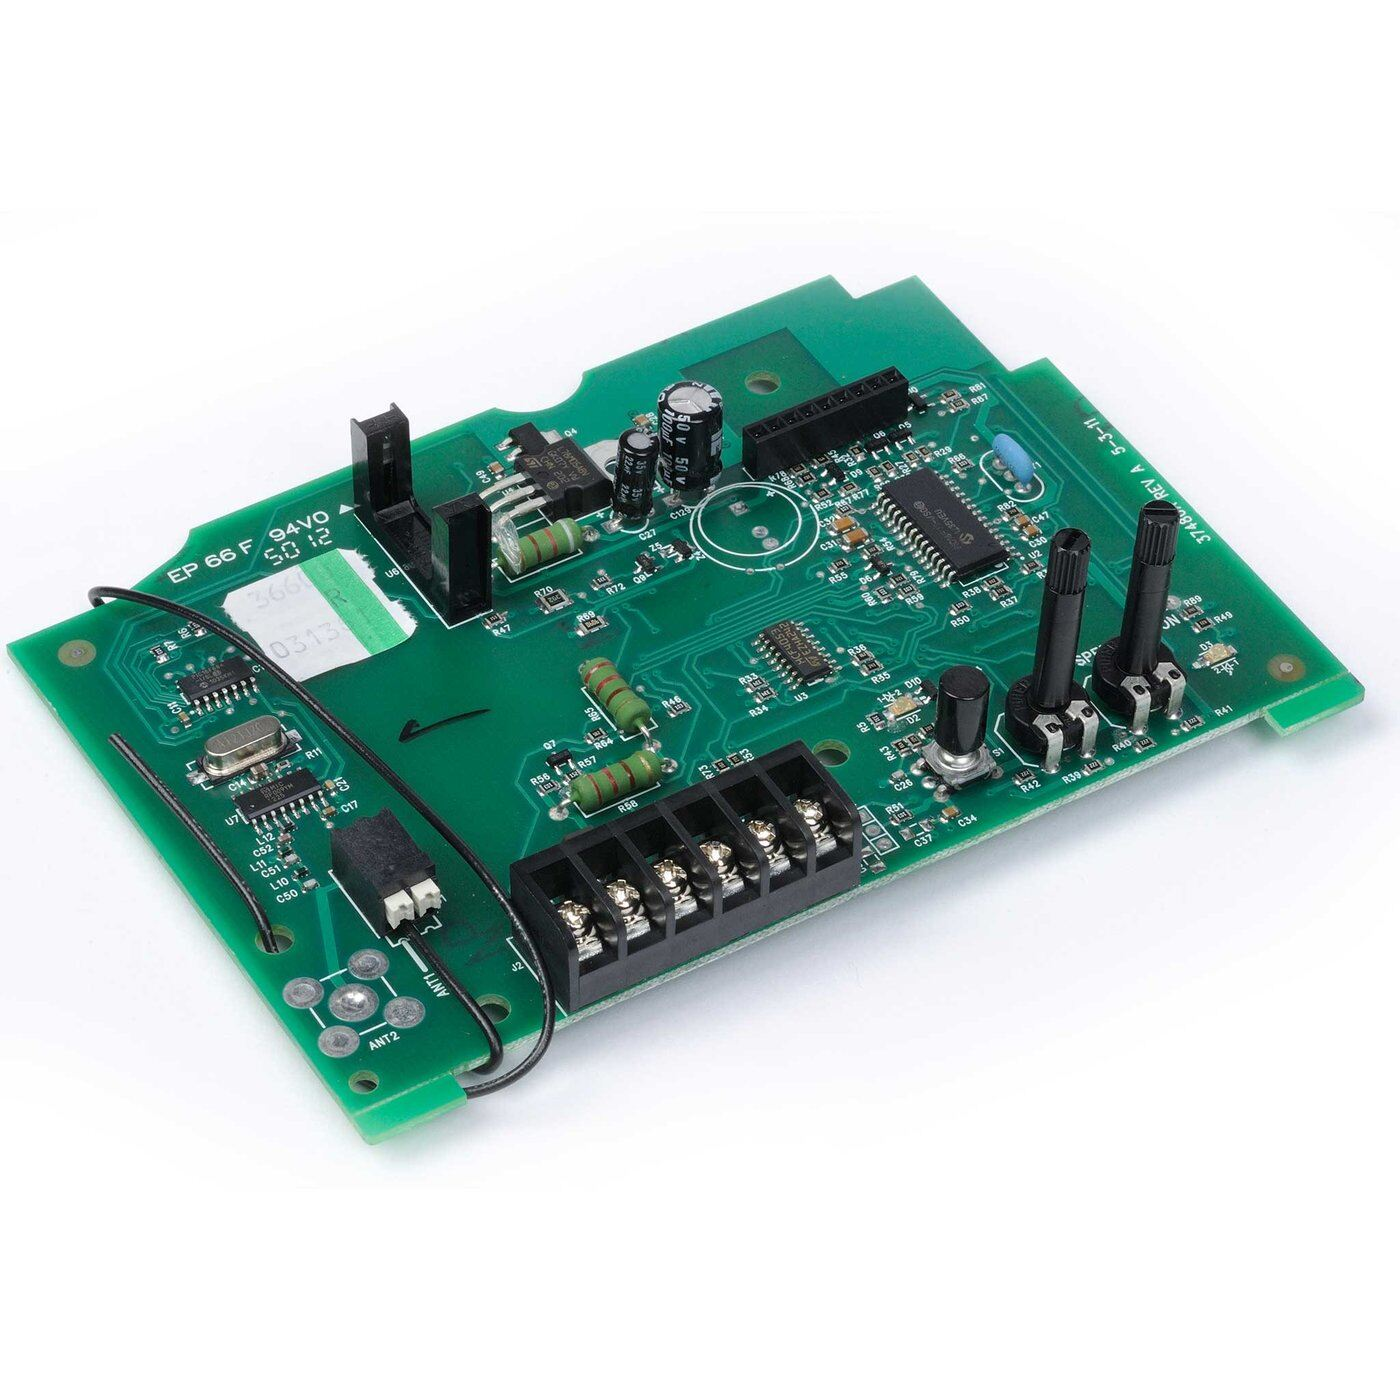 IC H 390 AC Screw Drive Powerhead IS INTELLICODE Genie 36521R.S RECEIVER ISL